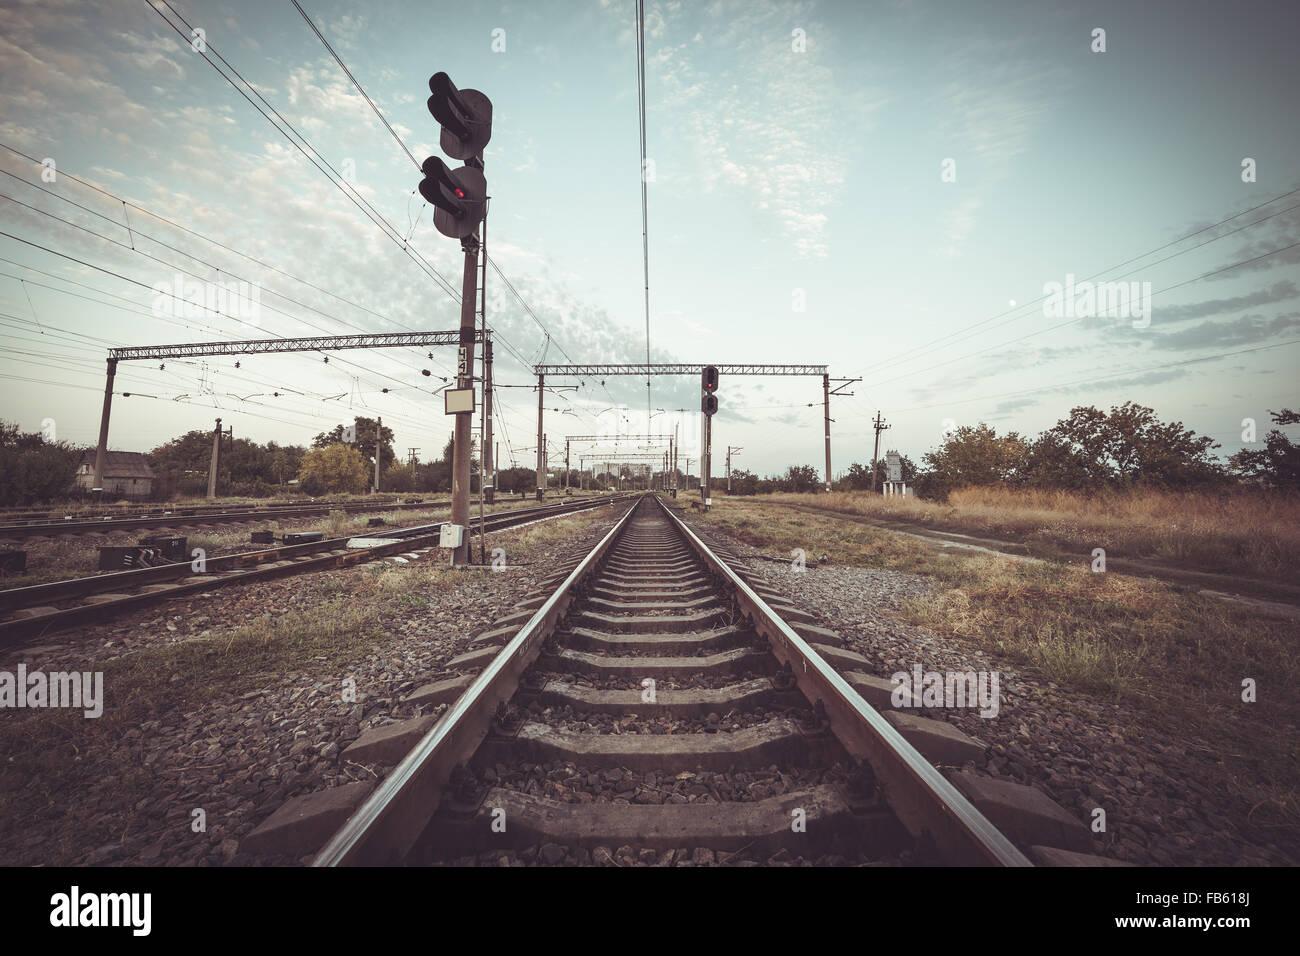 Train platform and traffic light at sunset. Railroad. Railway station. - Stock Image